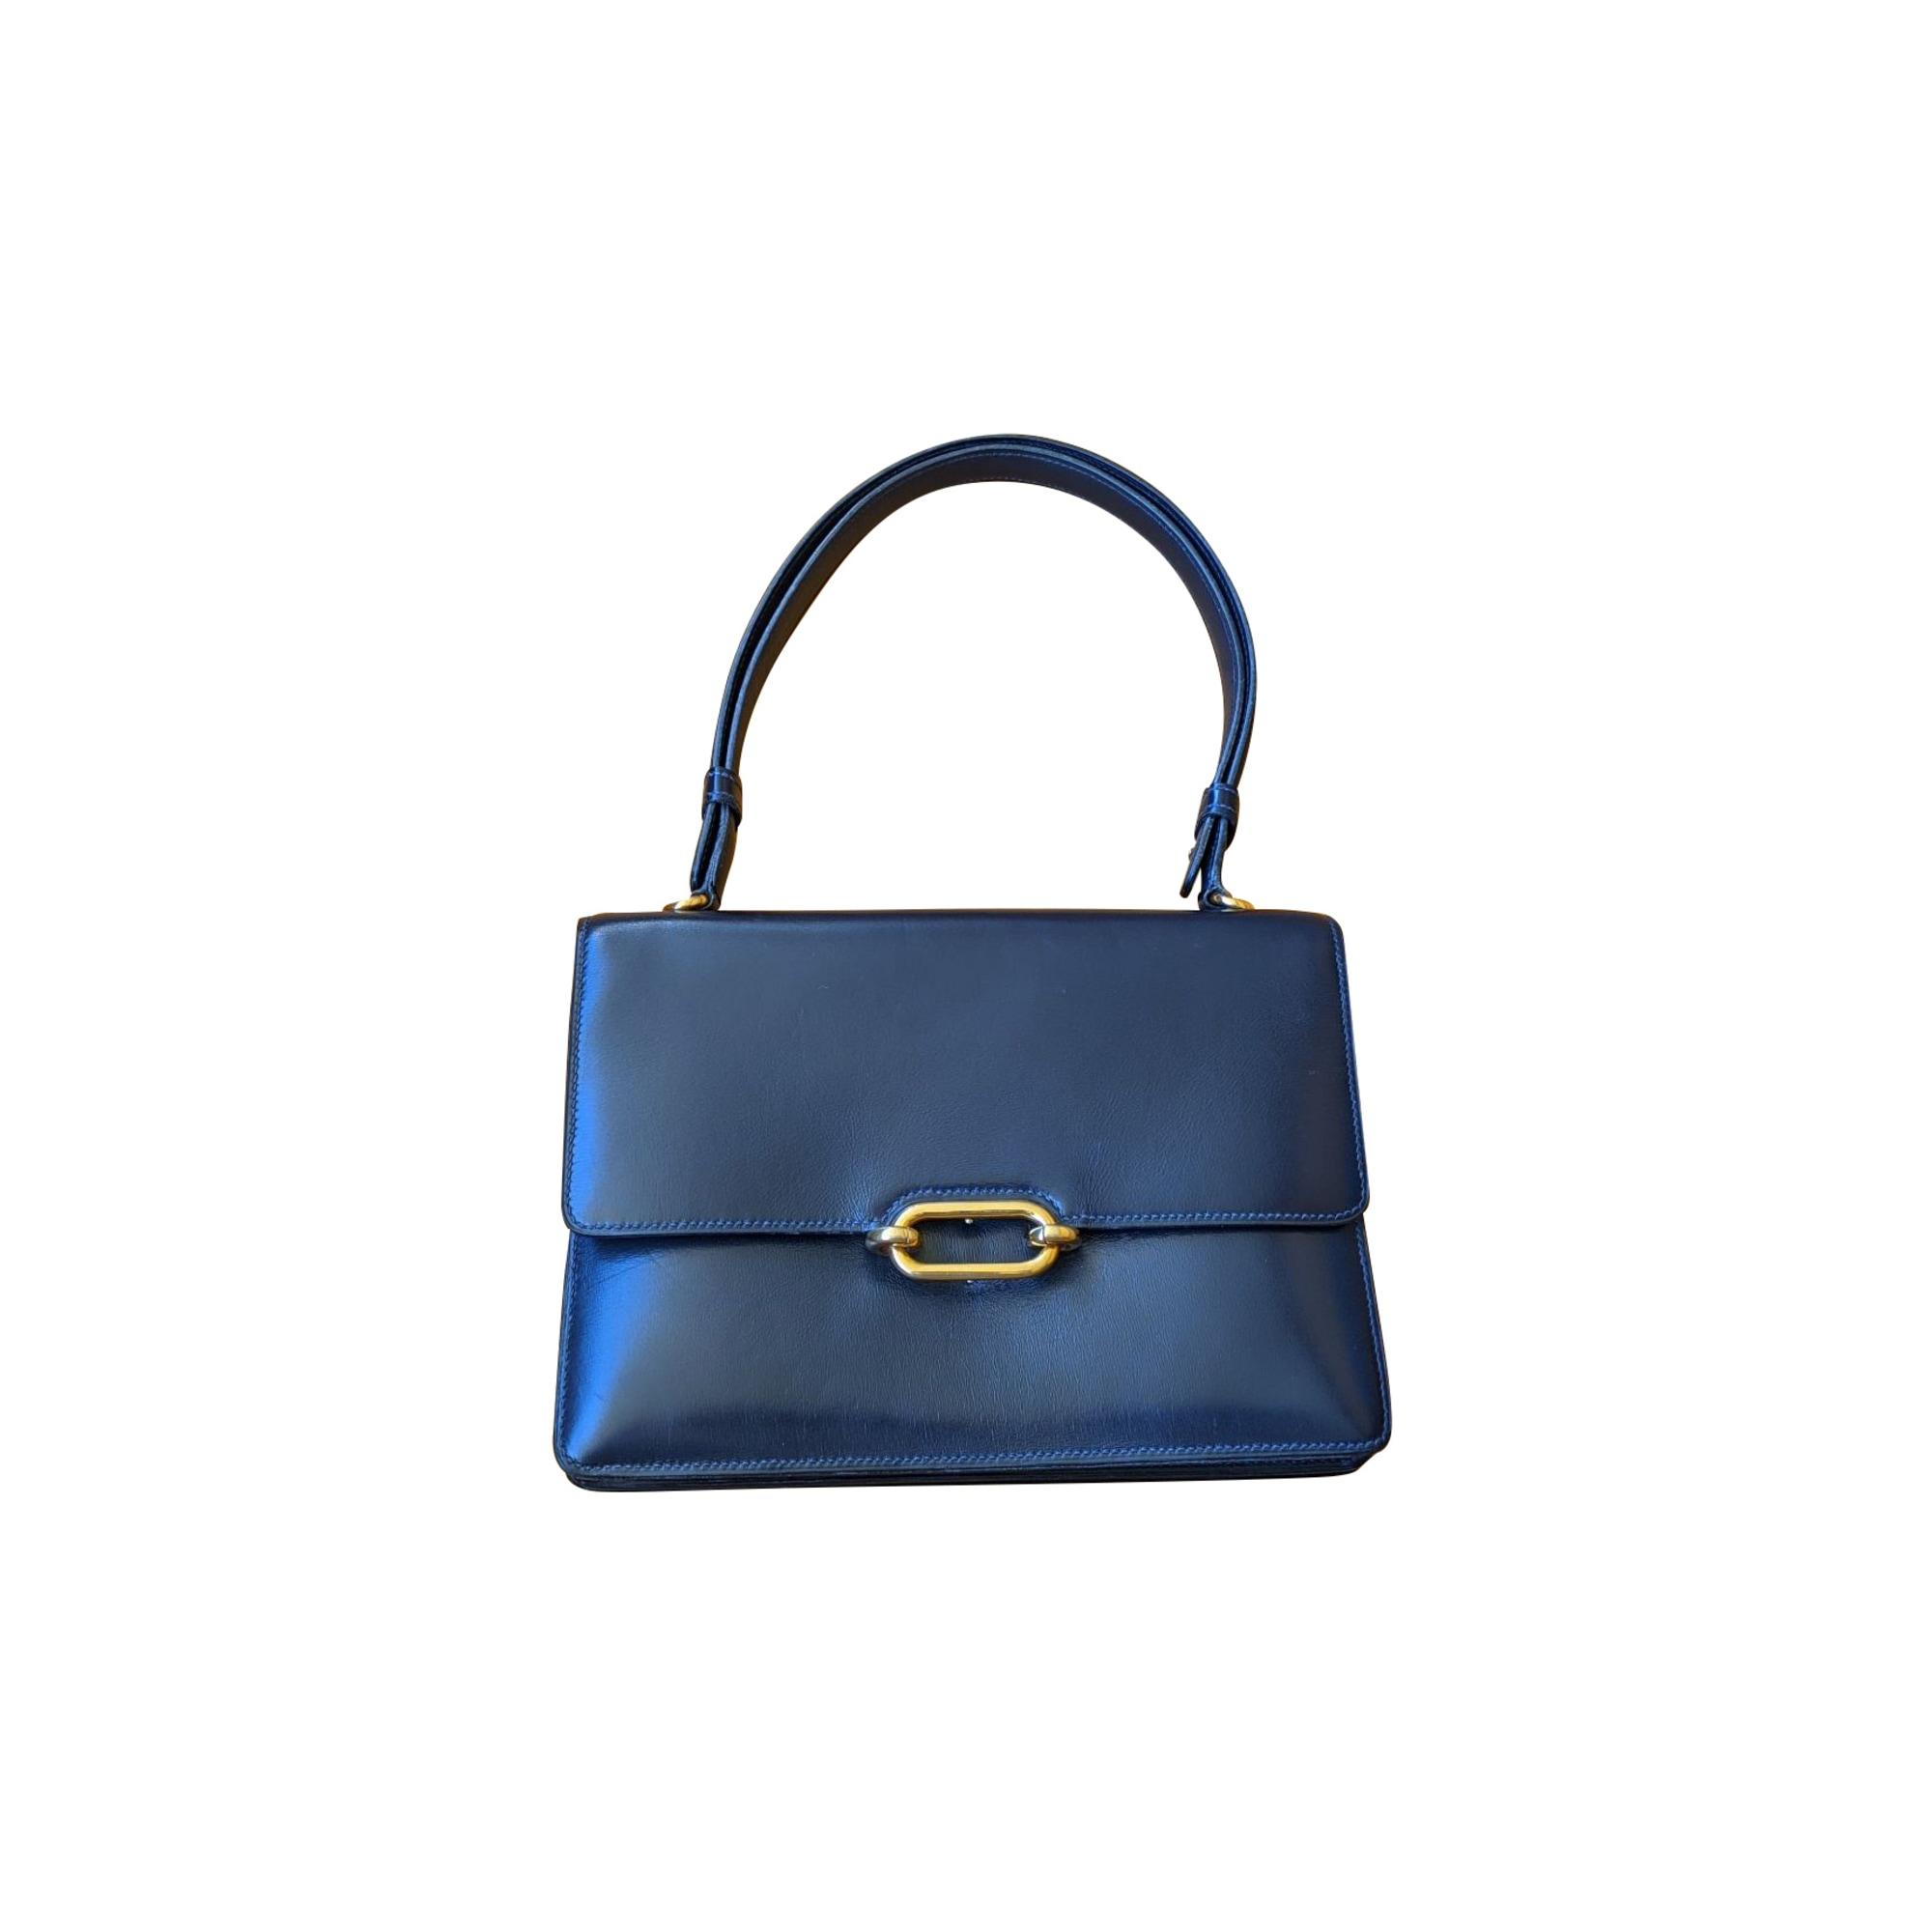 Lederhandtasche HERMÈS Blau, marineblau, türkisblau